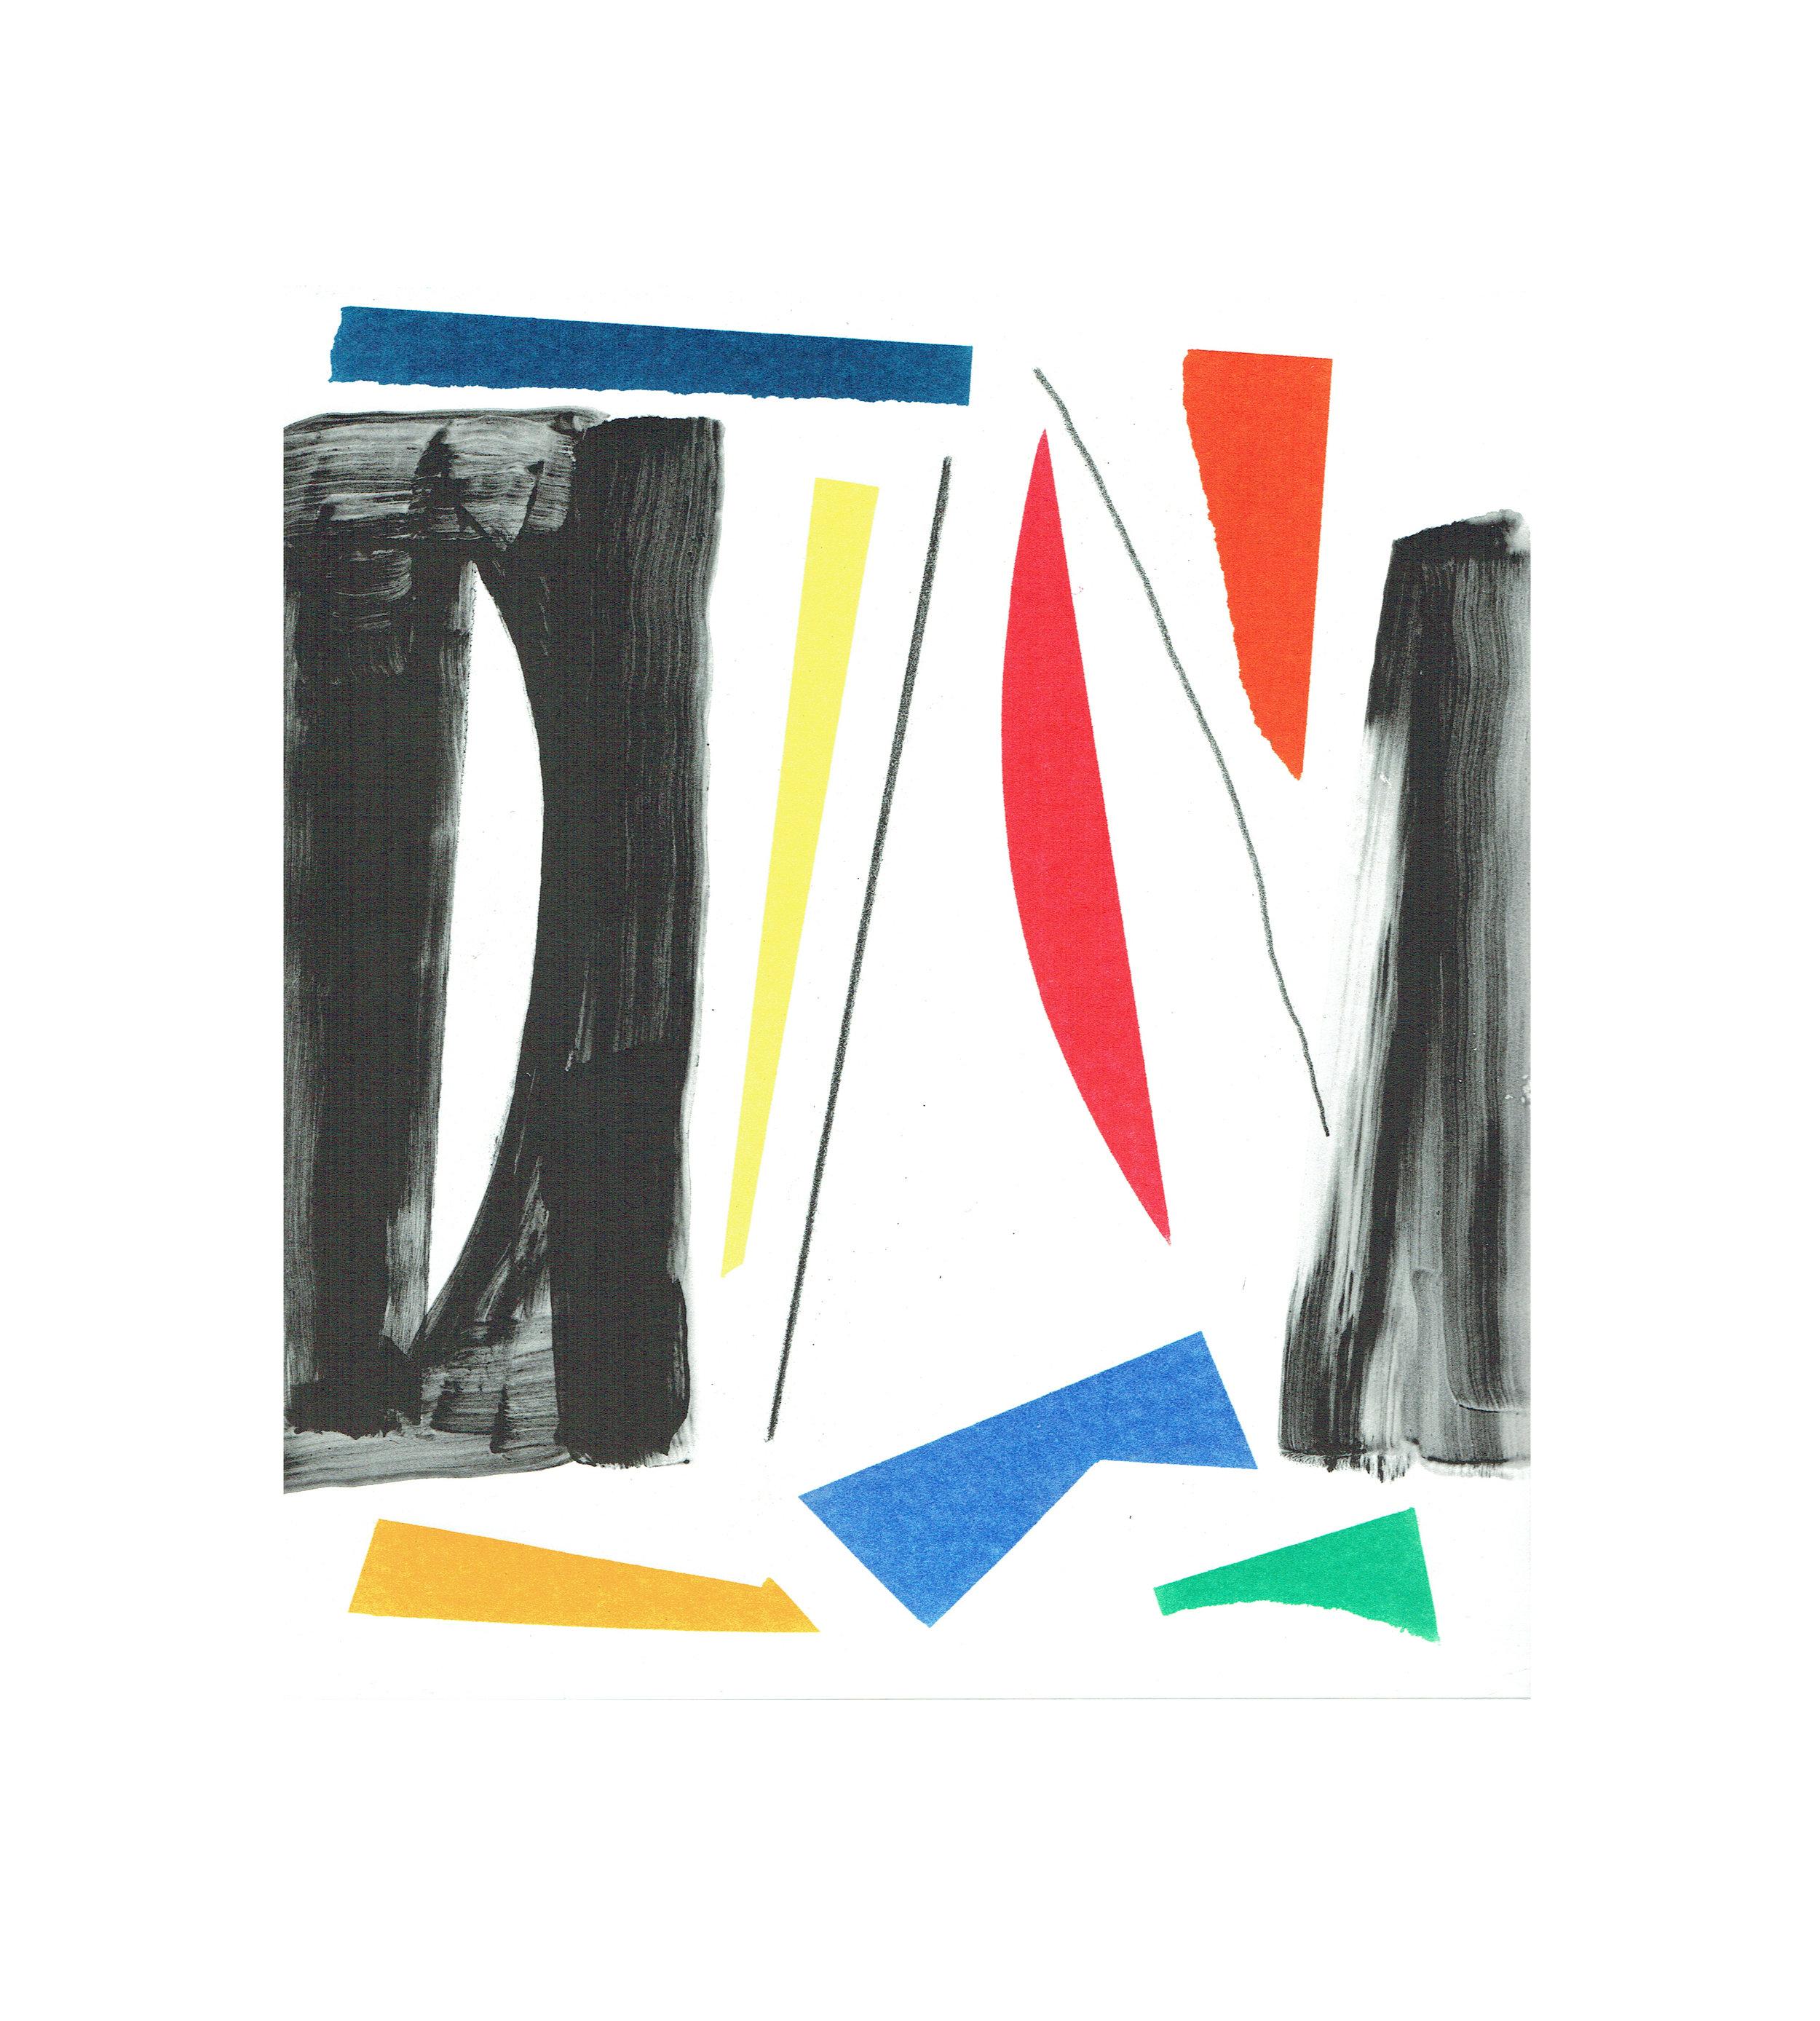 John McLean, Merry Go Round 3    Date: 2016  Size (cm - unframed):  38.2 x 34.4  Technique:  2 plate a la poupee etching  Materials:  Somerset Valvet 300gsm  Edition size:  20  Publisher: The Print Studio  Copyright: The Artist   POA